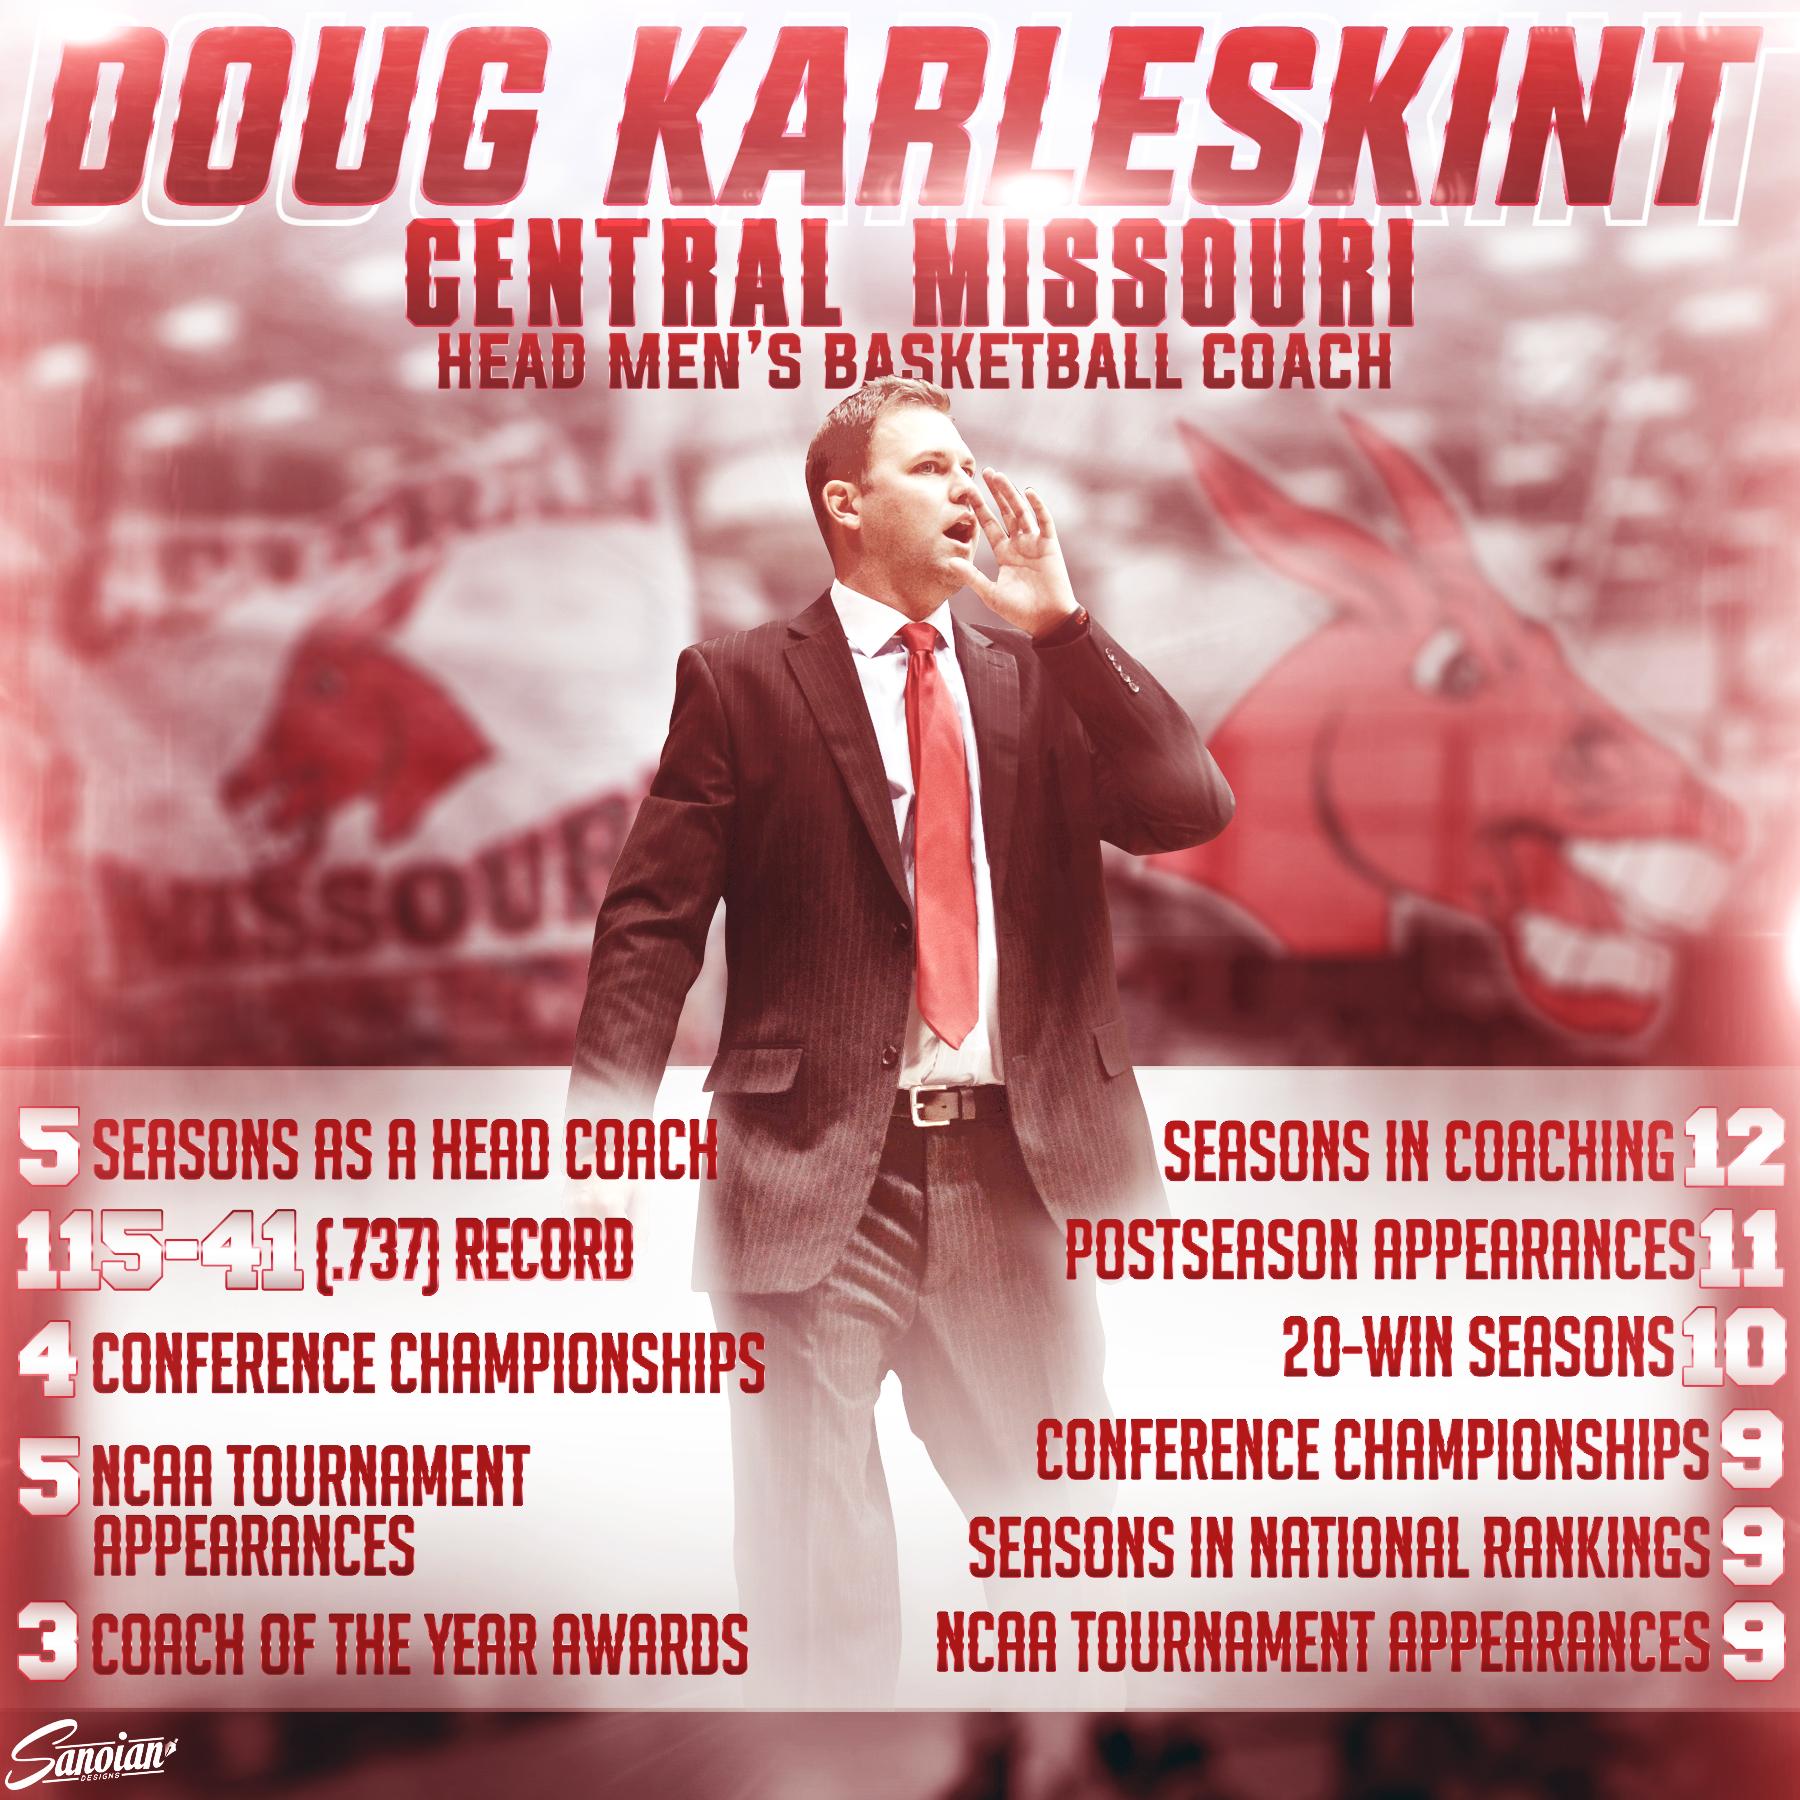 CoachKarleskint.jpg